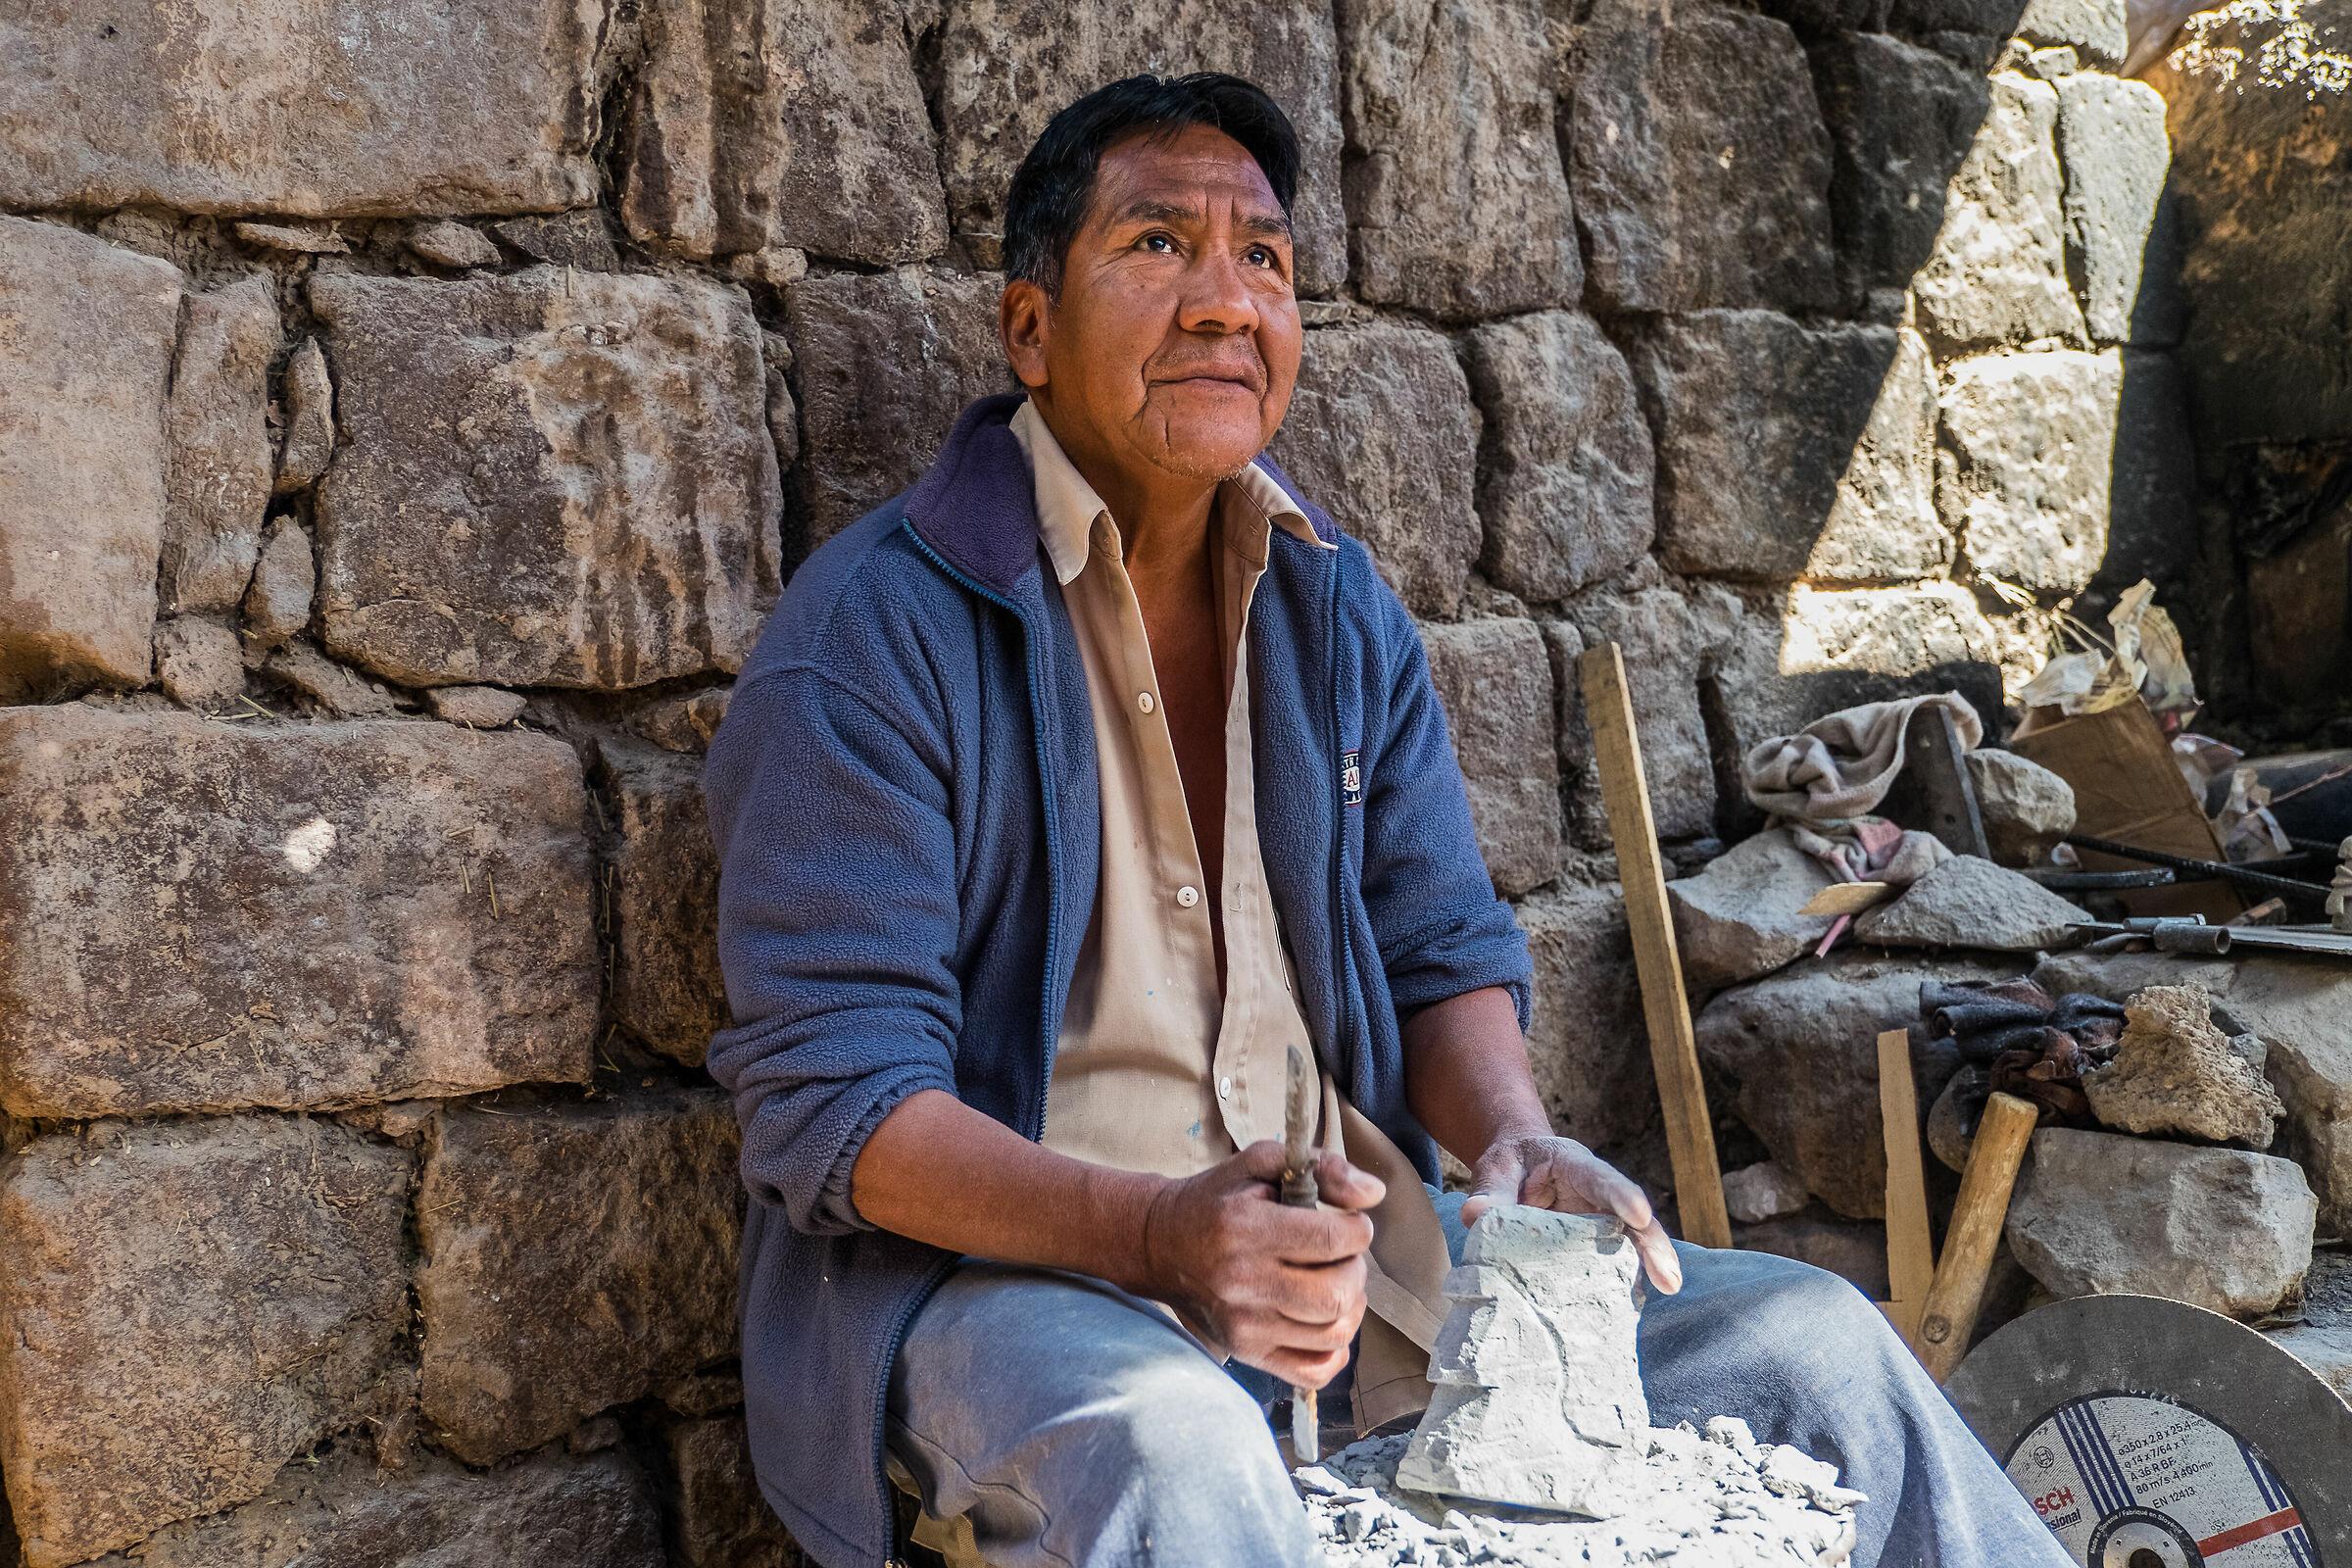 Sculptor of Andea rock between walls of adobe...